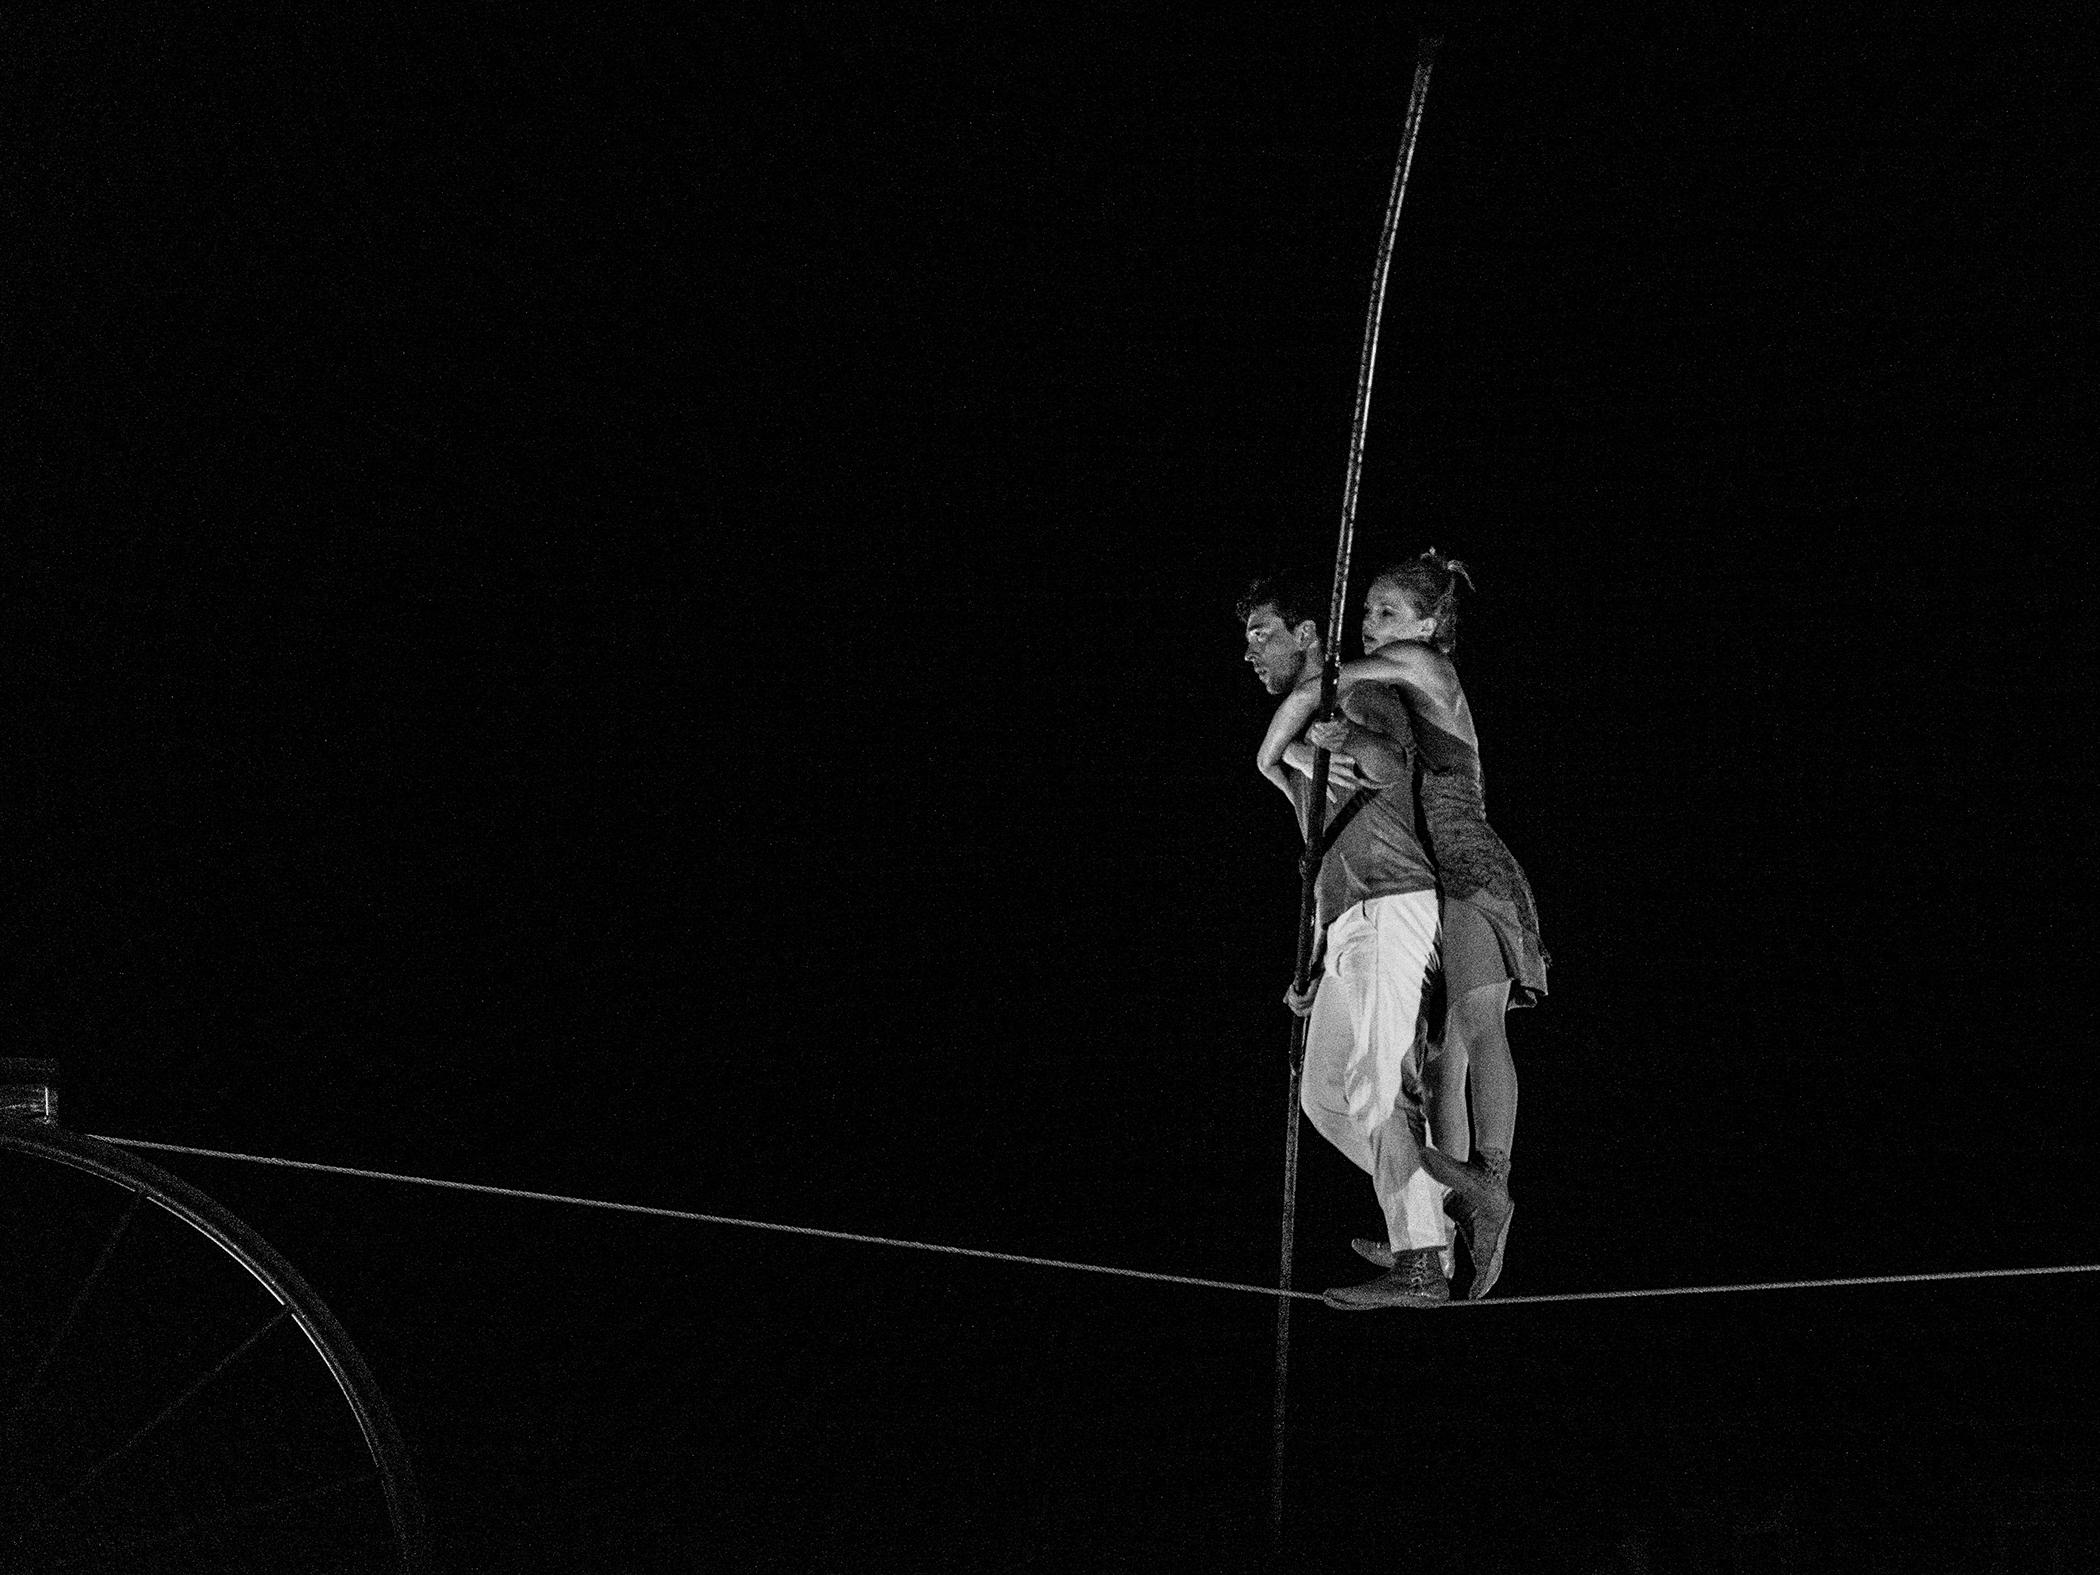 spectacles-sodade-cirque-rouage-mirabelle-metz-2015-marie-colette-becker-07